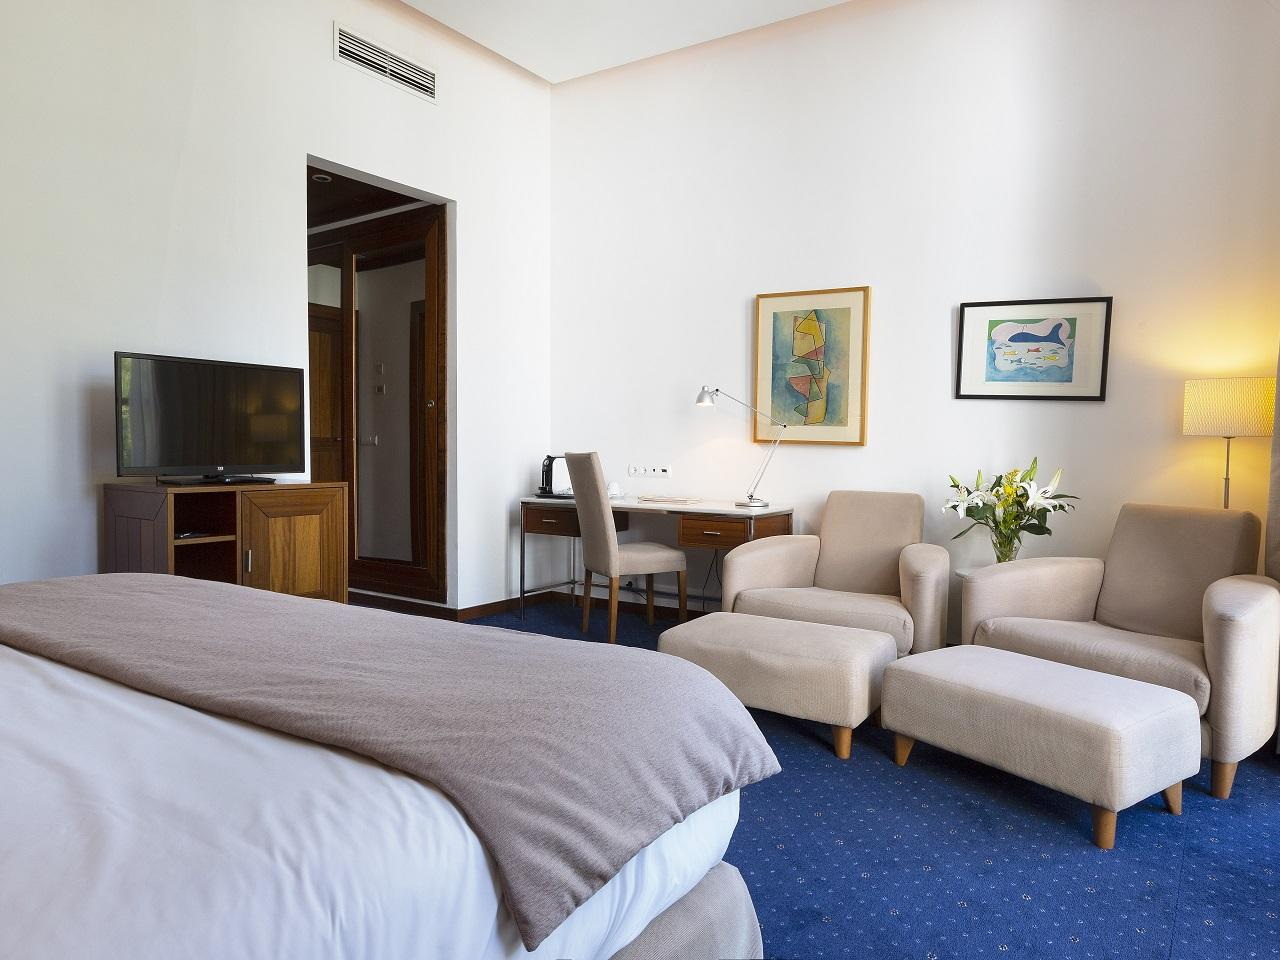 Imperial Suite at Gran Hotel Sóller in Sóller, Majorca